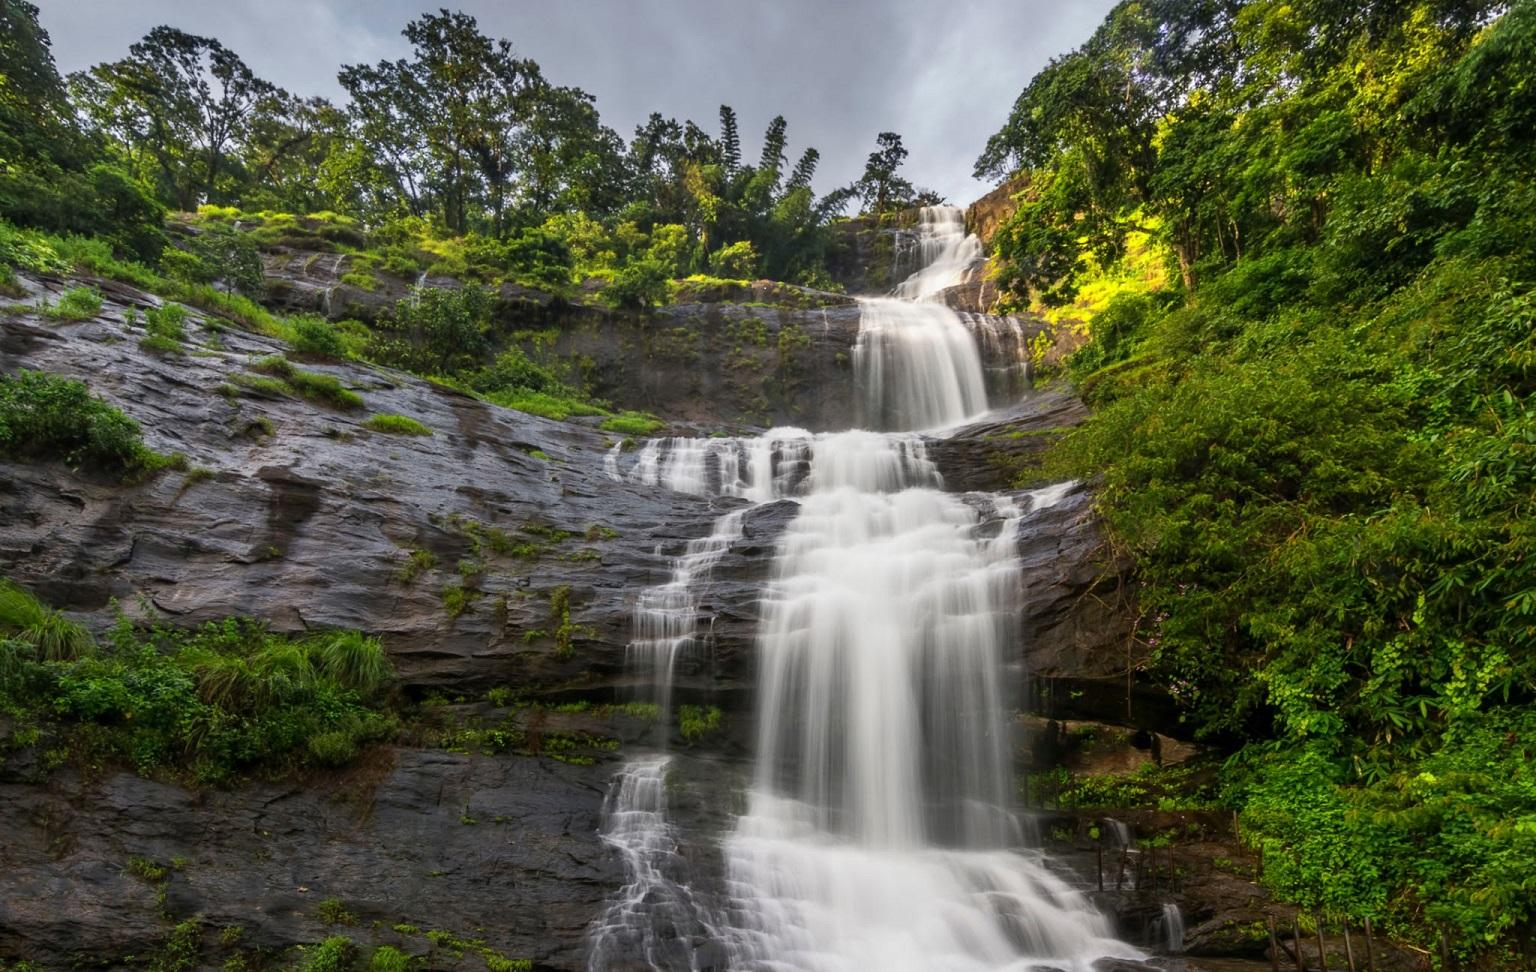 Munnar Water falls